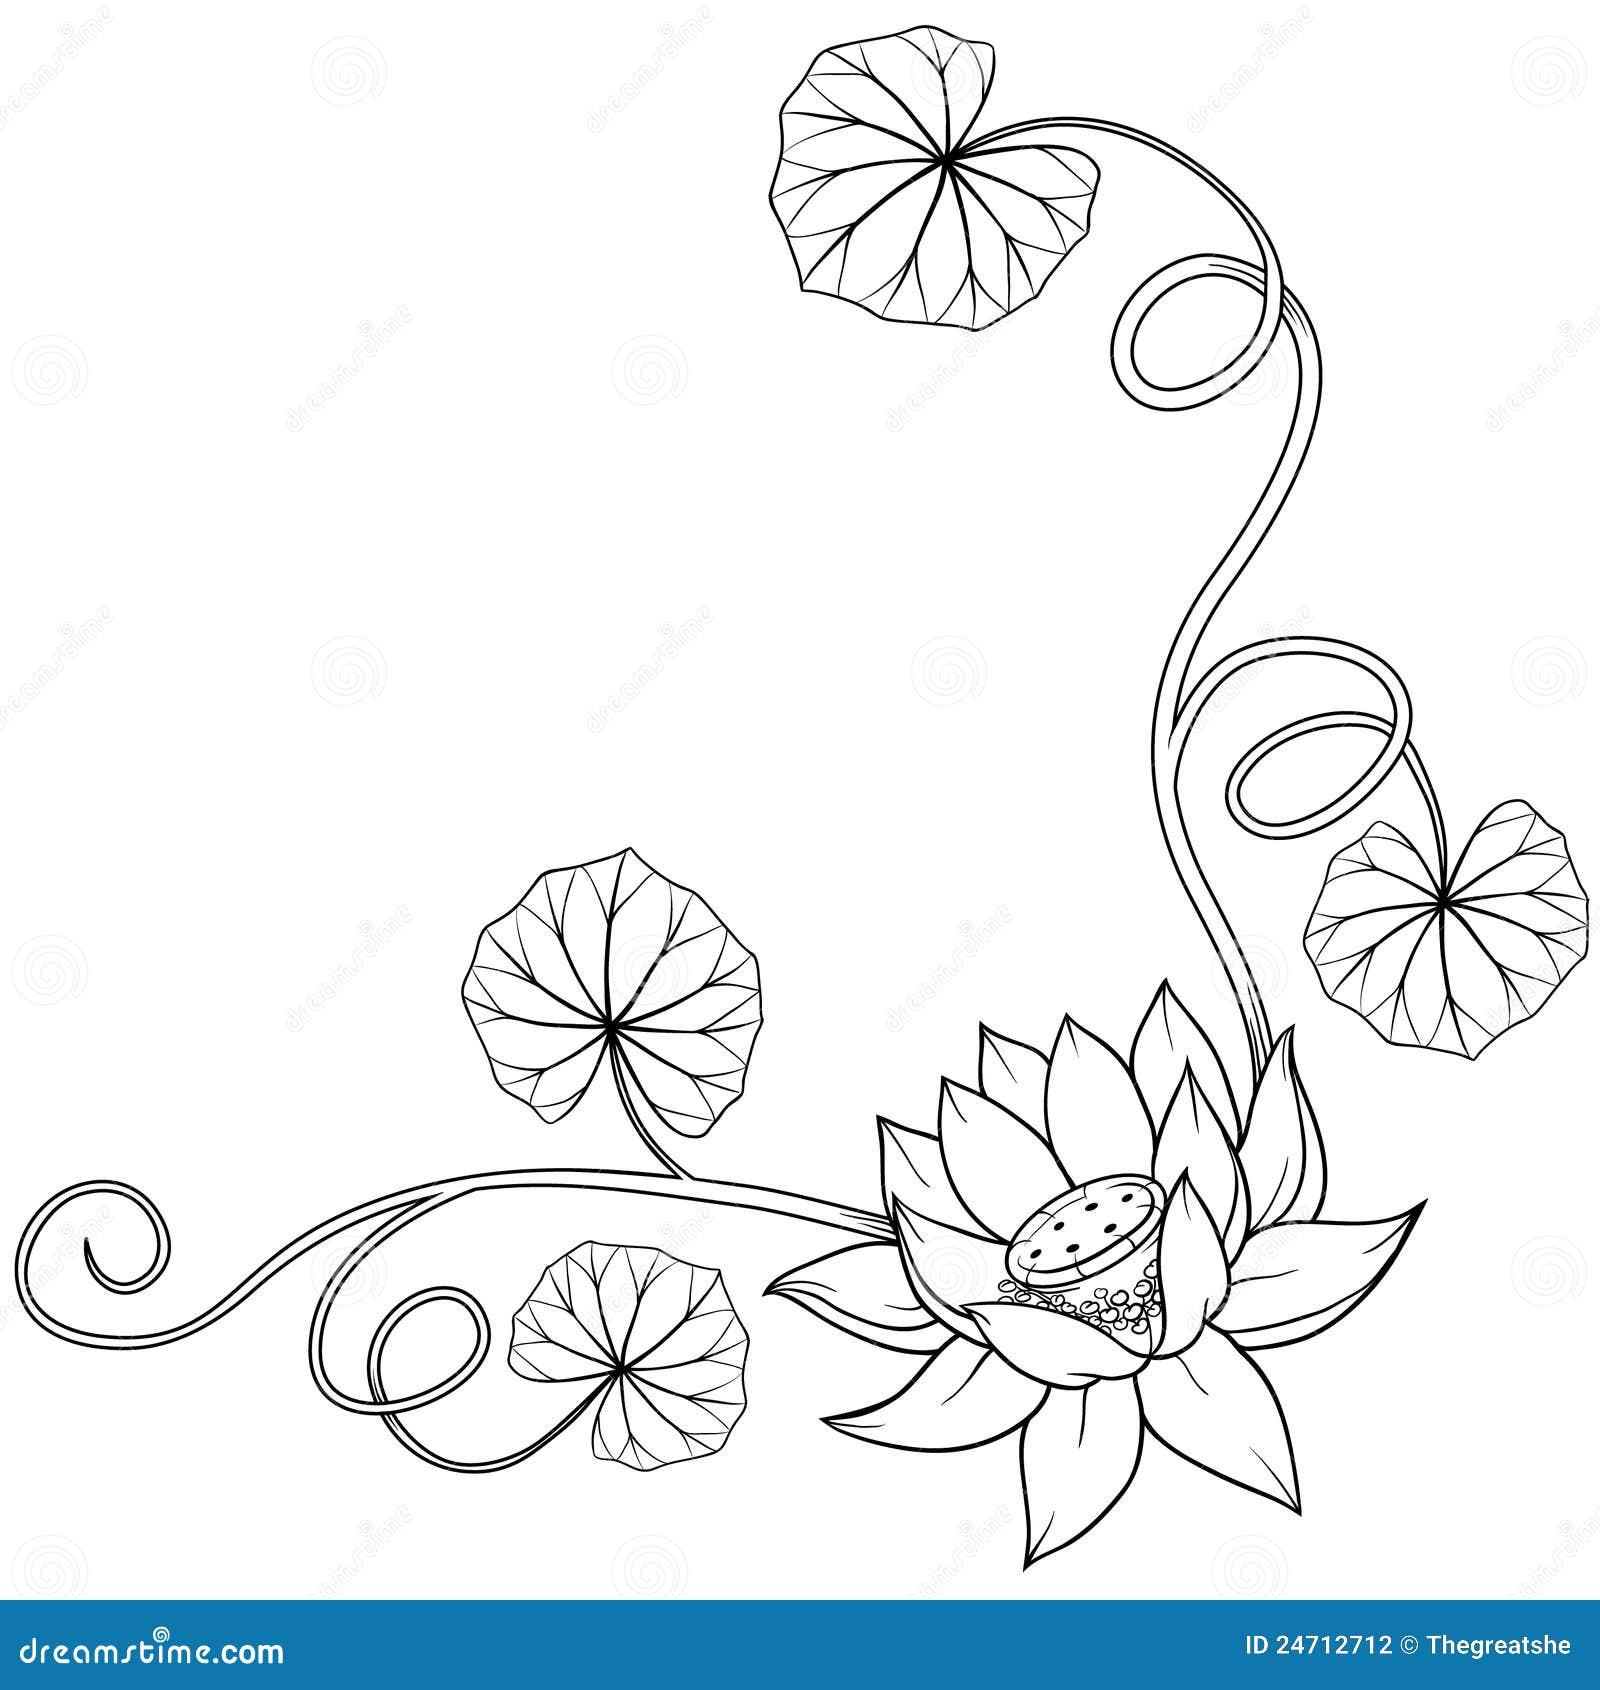 Lotus flower curly frame corner with leaves stock vector lotus flower curly frame corner with leaves izmirmasajfo